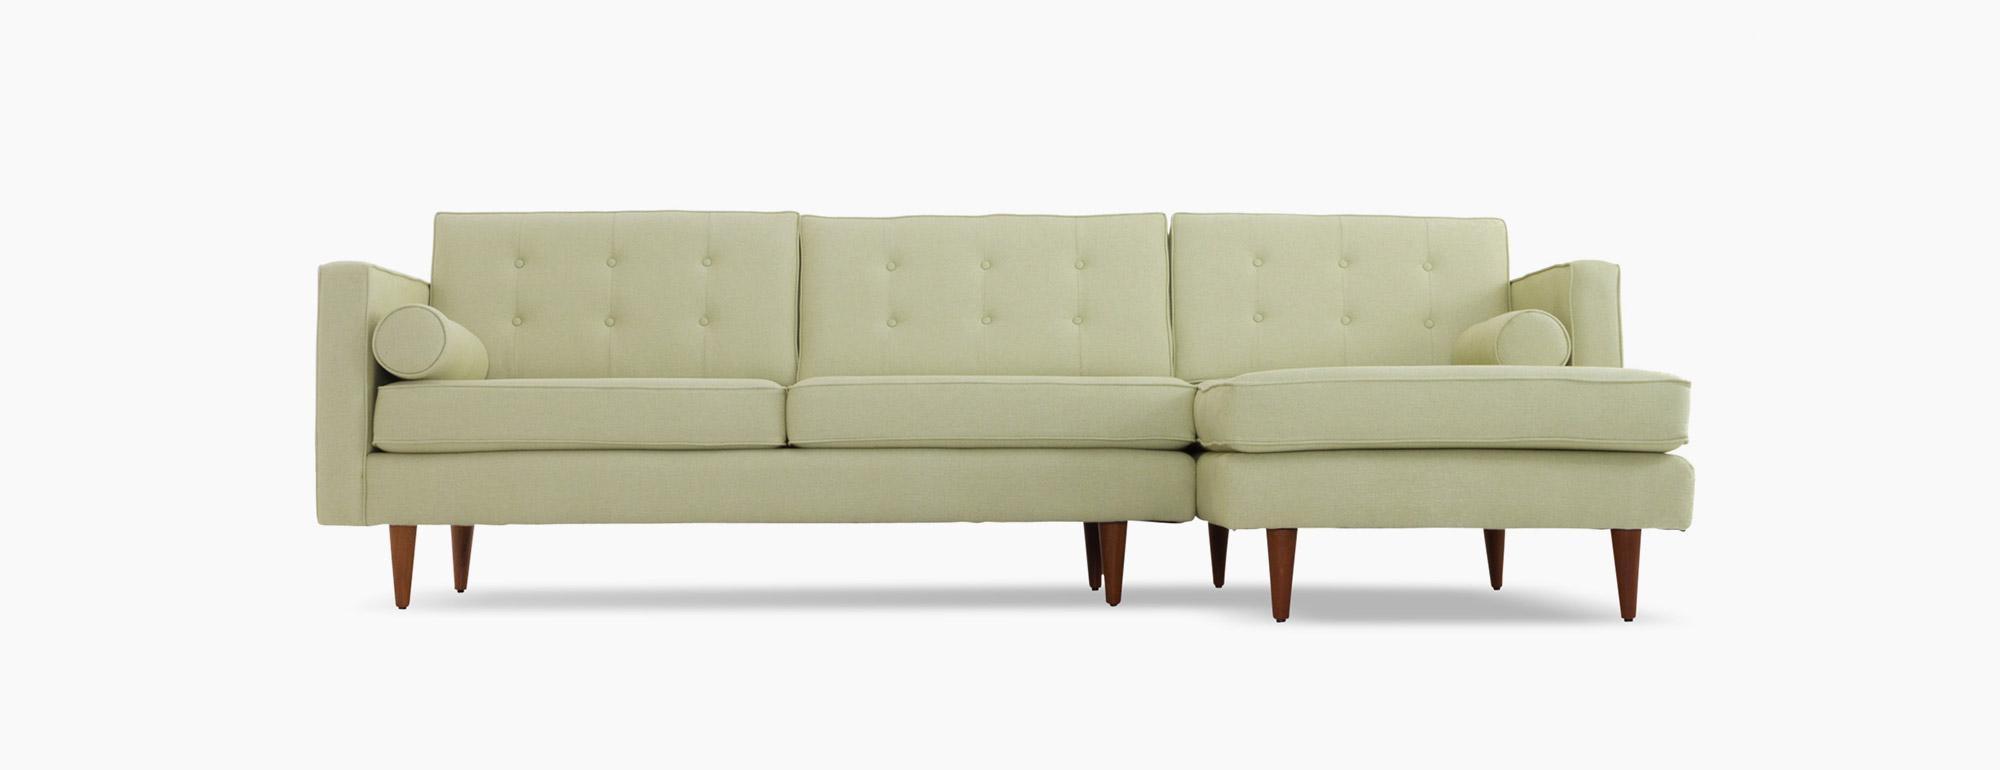 Braxton Sectional | Joybird Inside Braxton Sectional Sofas (View 5 of 20)